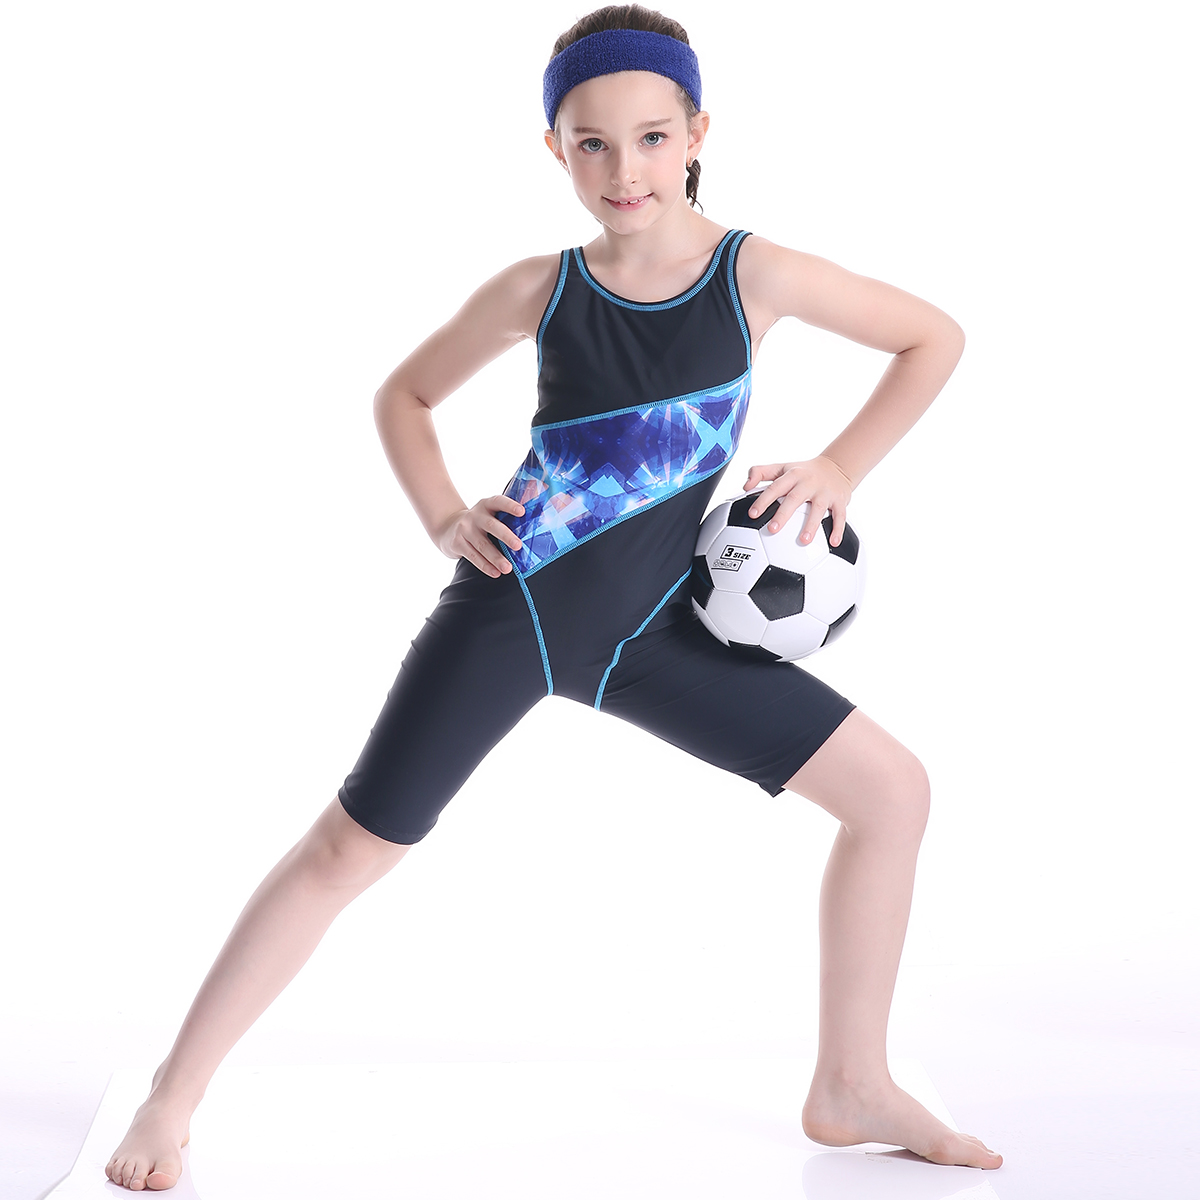 Girls Swimwear One Piece Swimsuit Children Professional Sports Swimwear Bodysuit Beachwear Baby Swim Surf Suits Bathing Suit